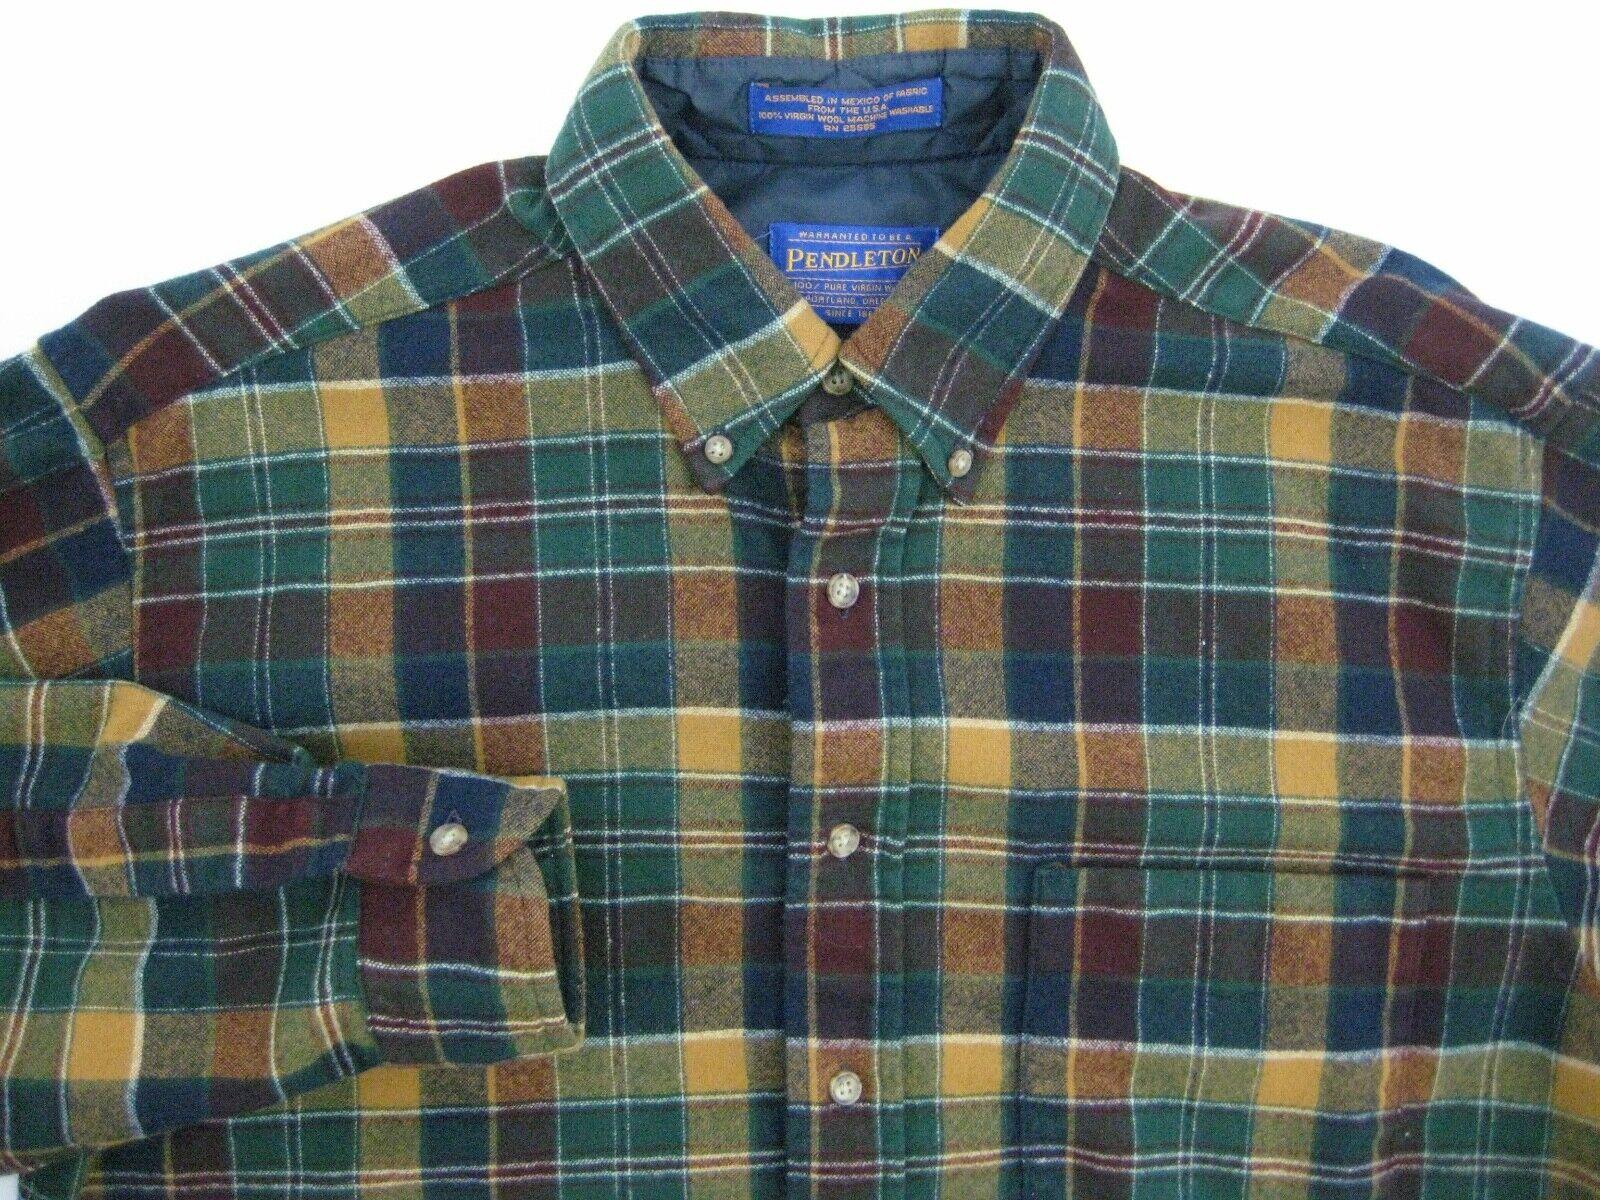 Pendleton Virgin Wool Plaid Button Down Mens Long Sleeve Vintage Shirt - Medium